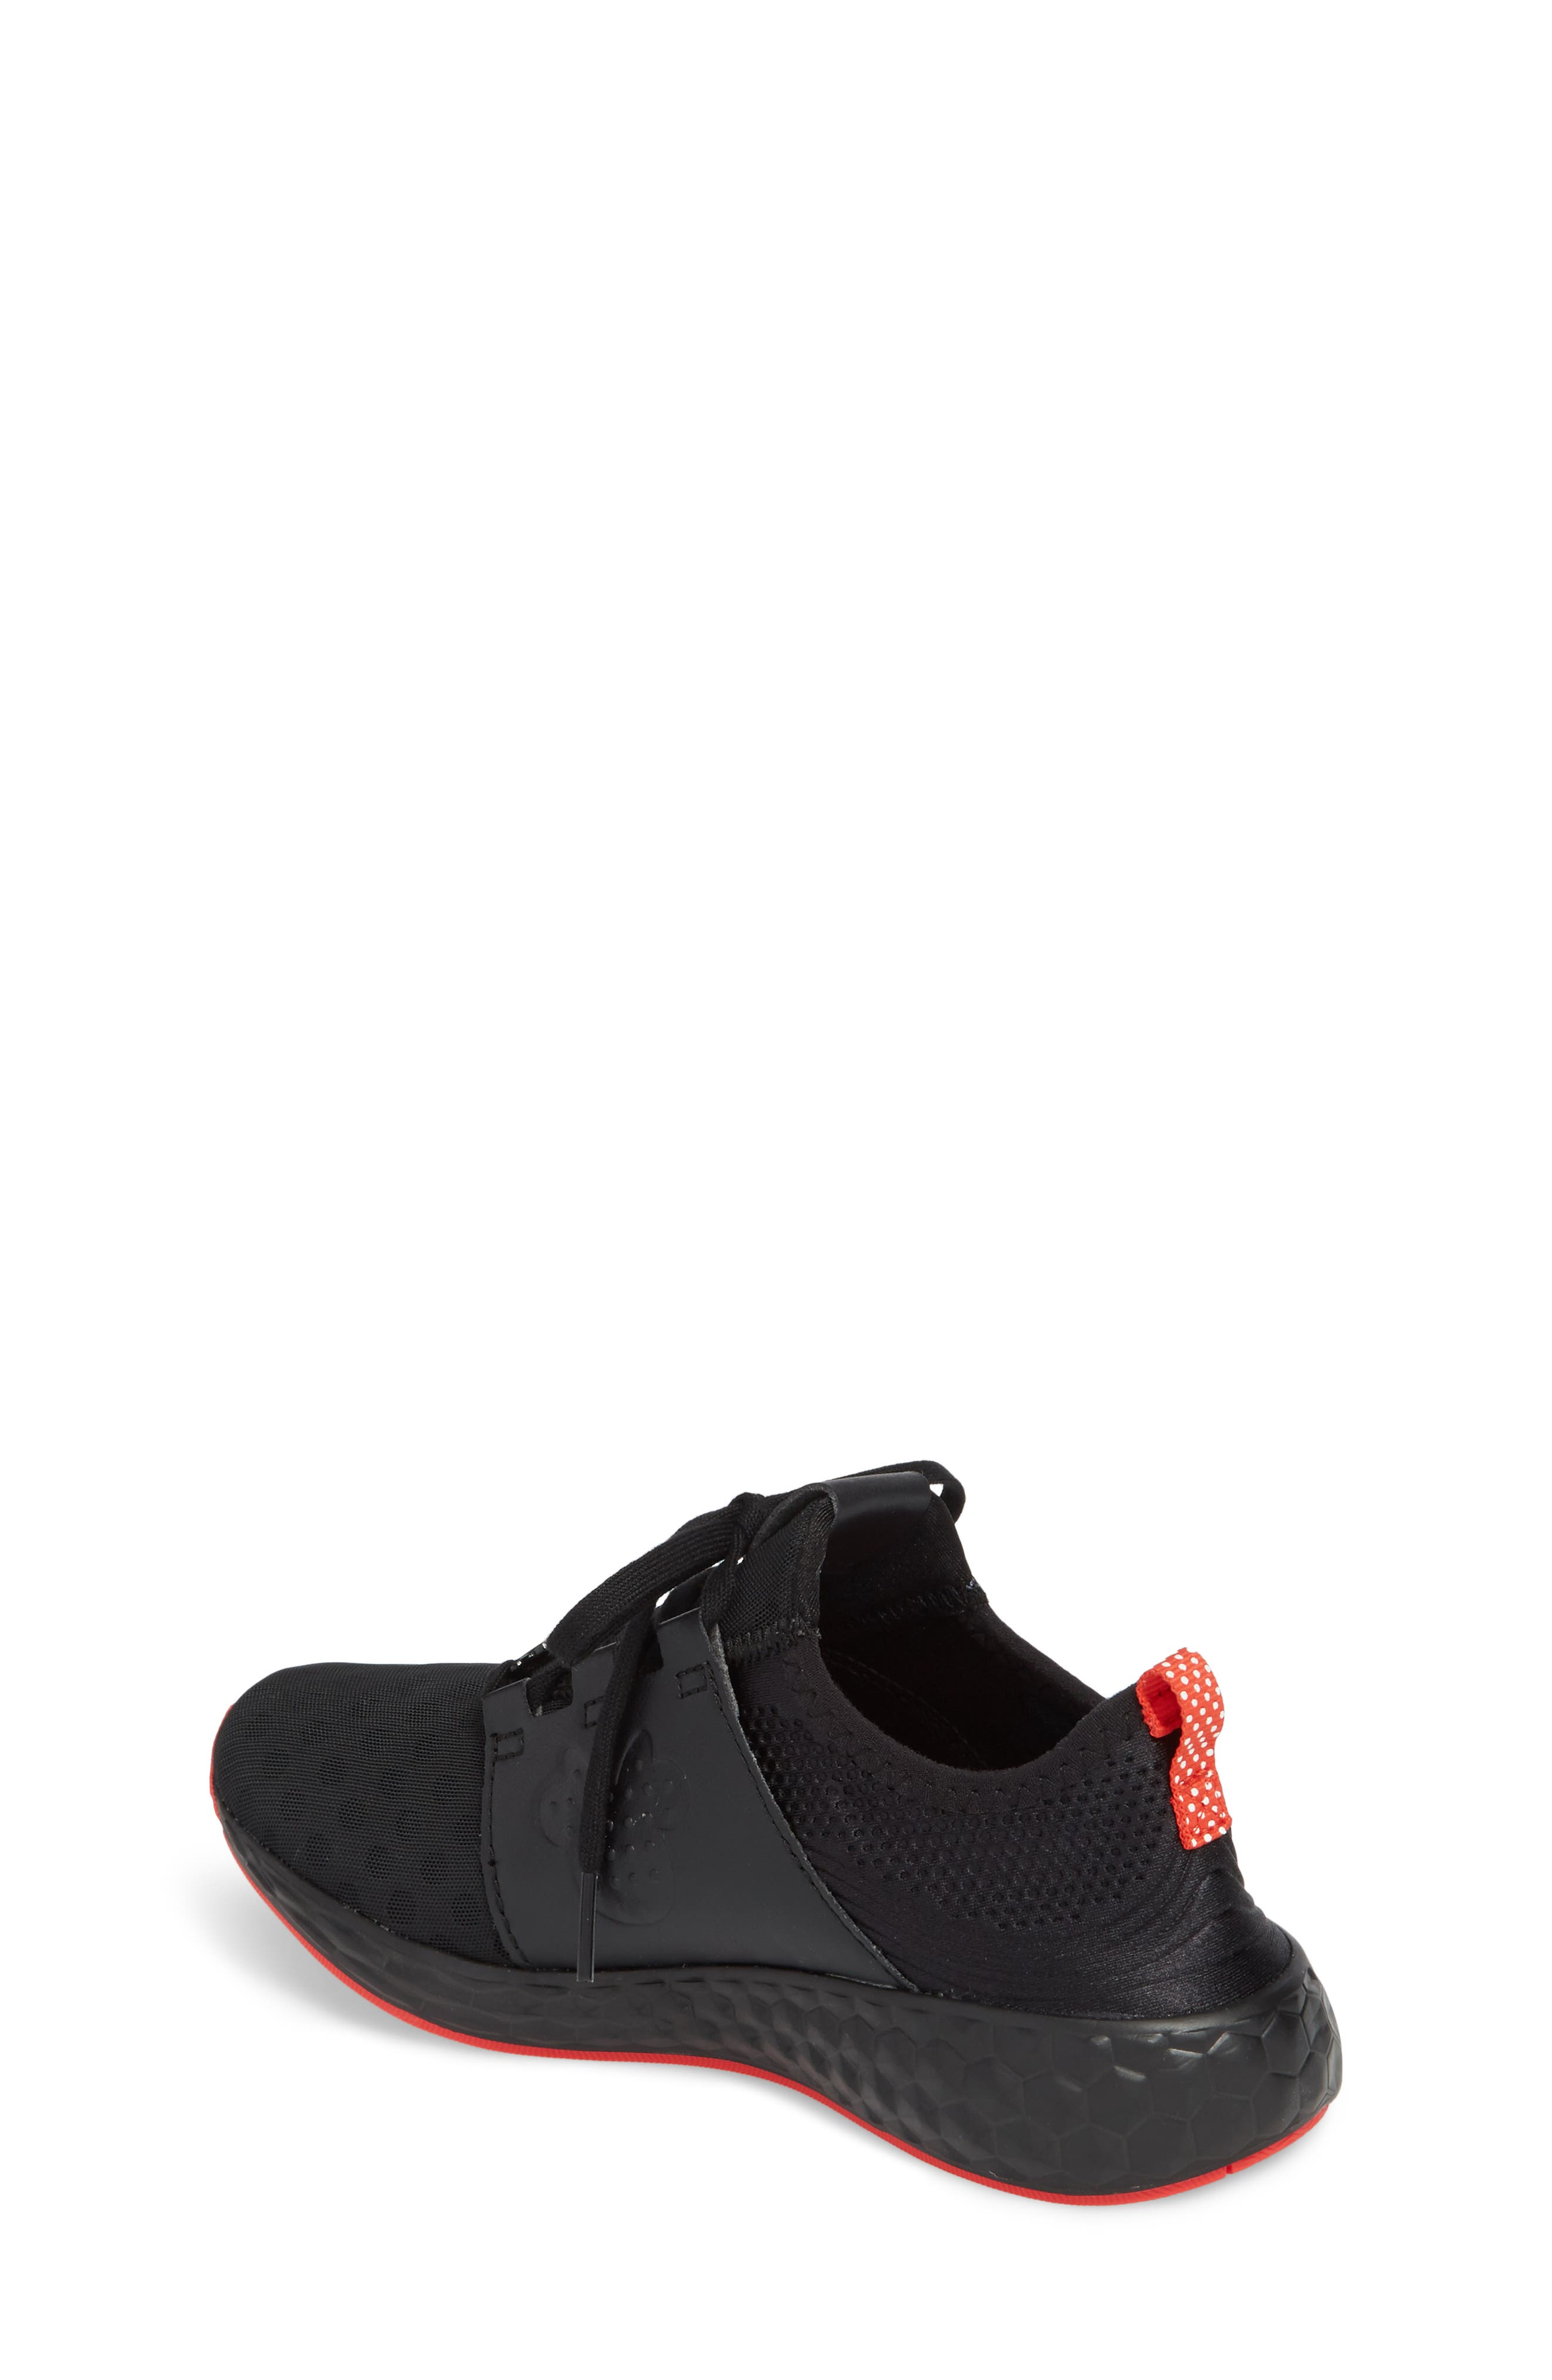 x Disney Minnie Mouse Cruz Sport Sneaker,                             Alternate thumbnail 2, color,                             Black/ Red